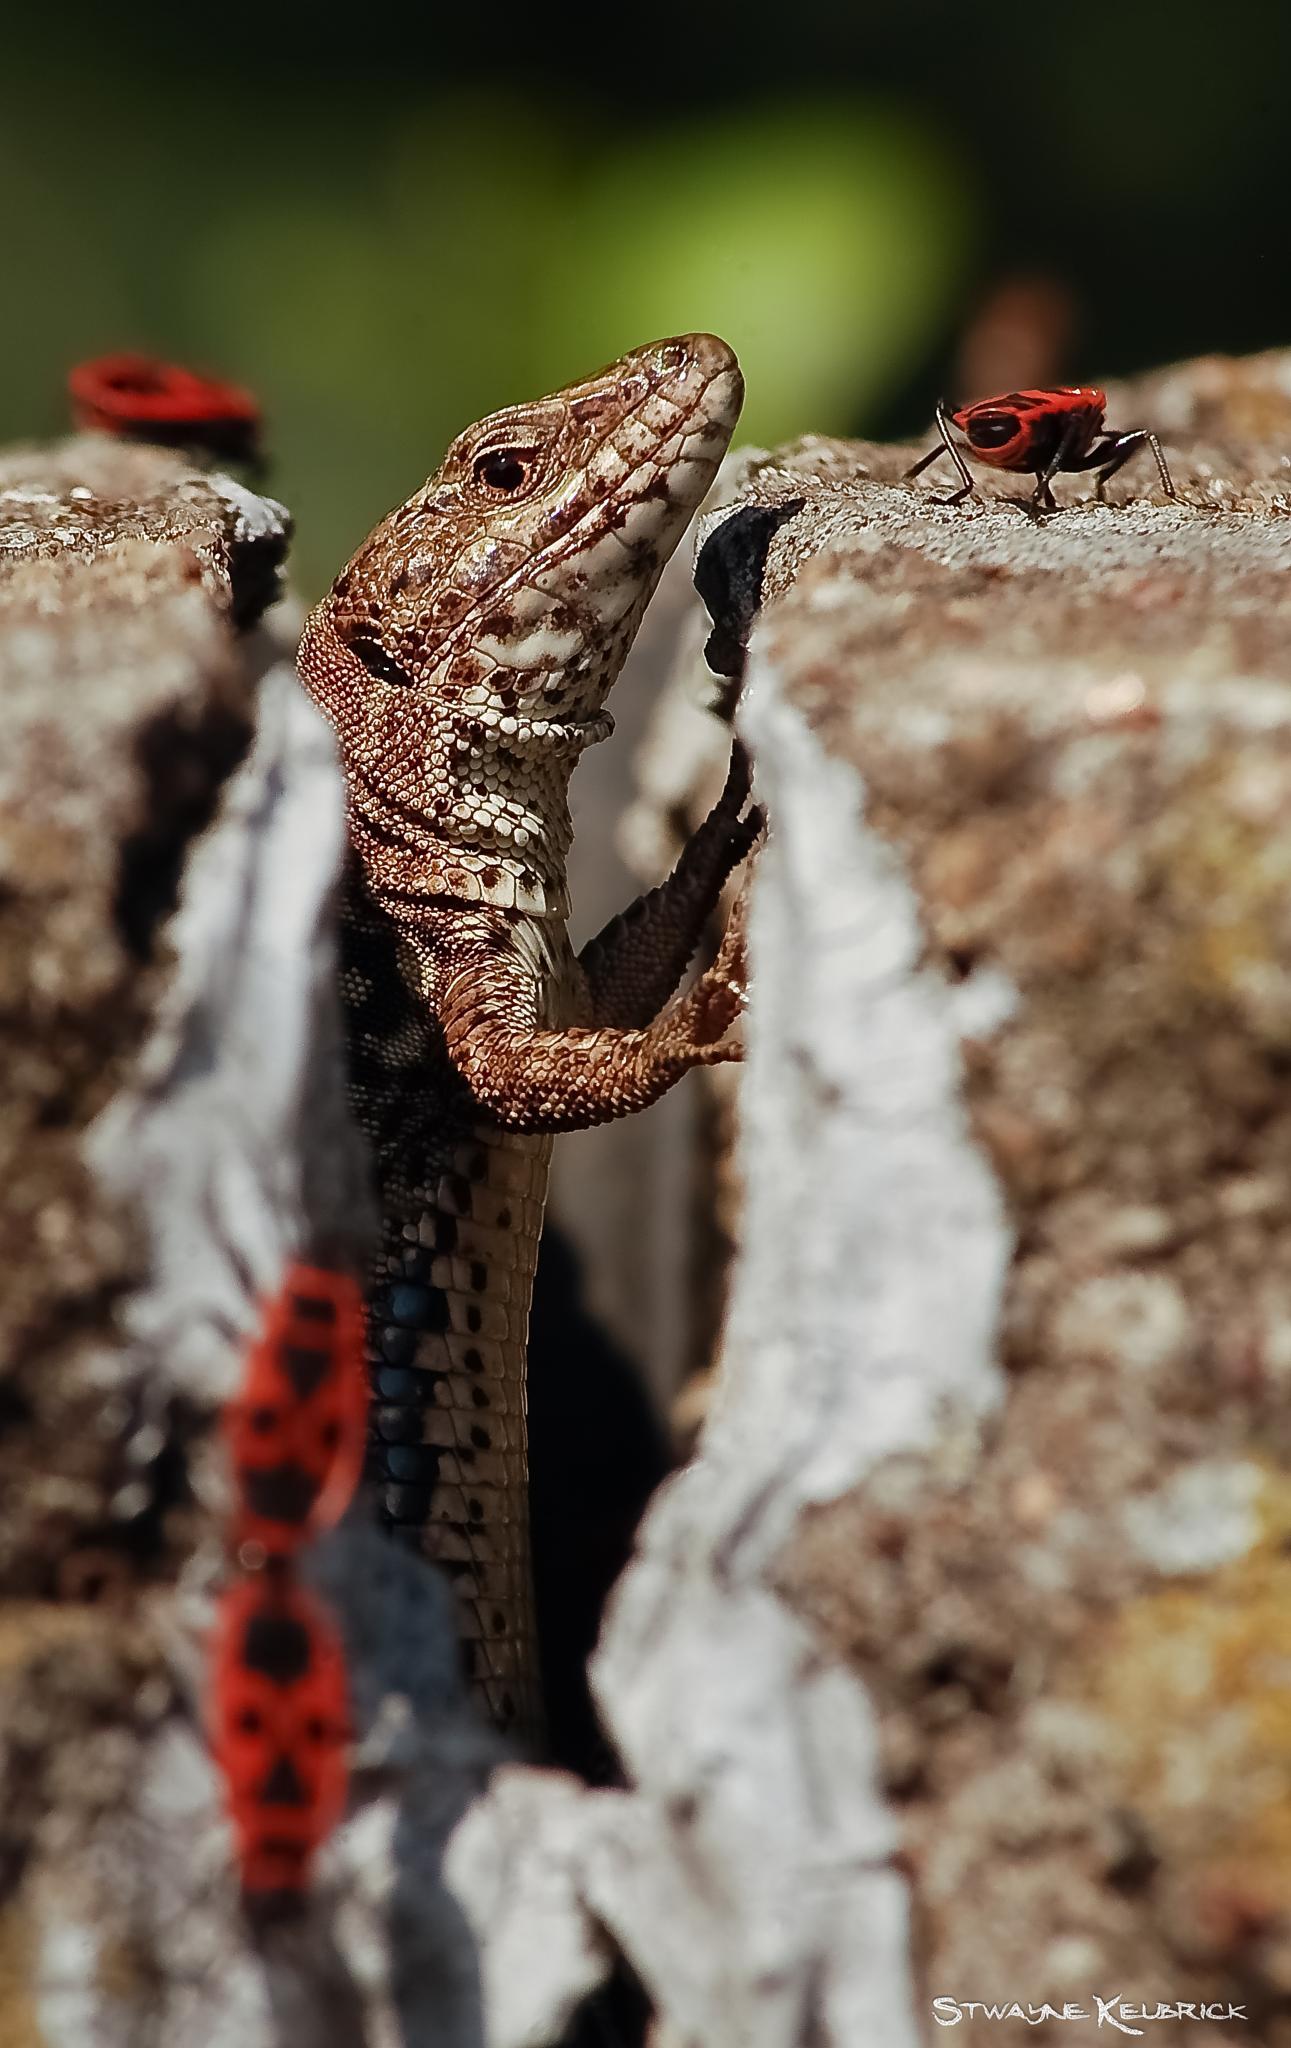 Random Lizard by Stwayne Keubrick